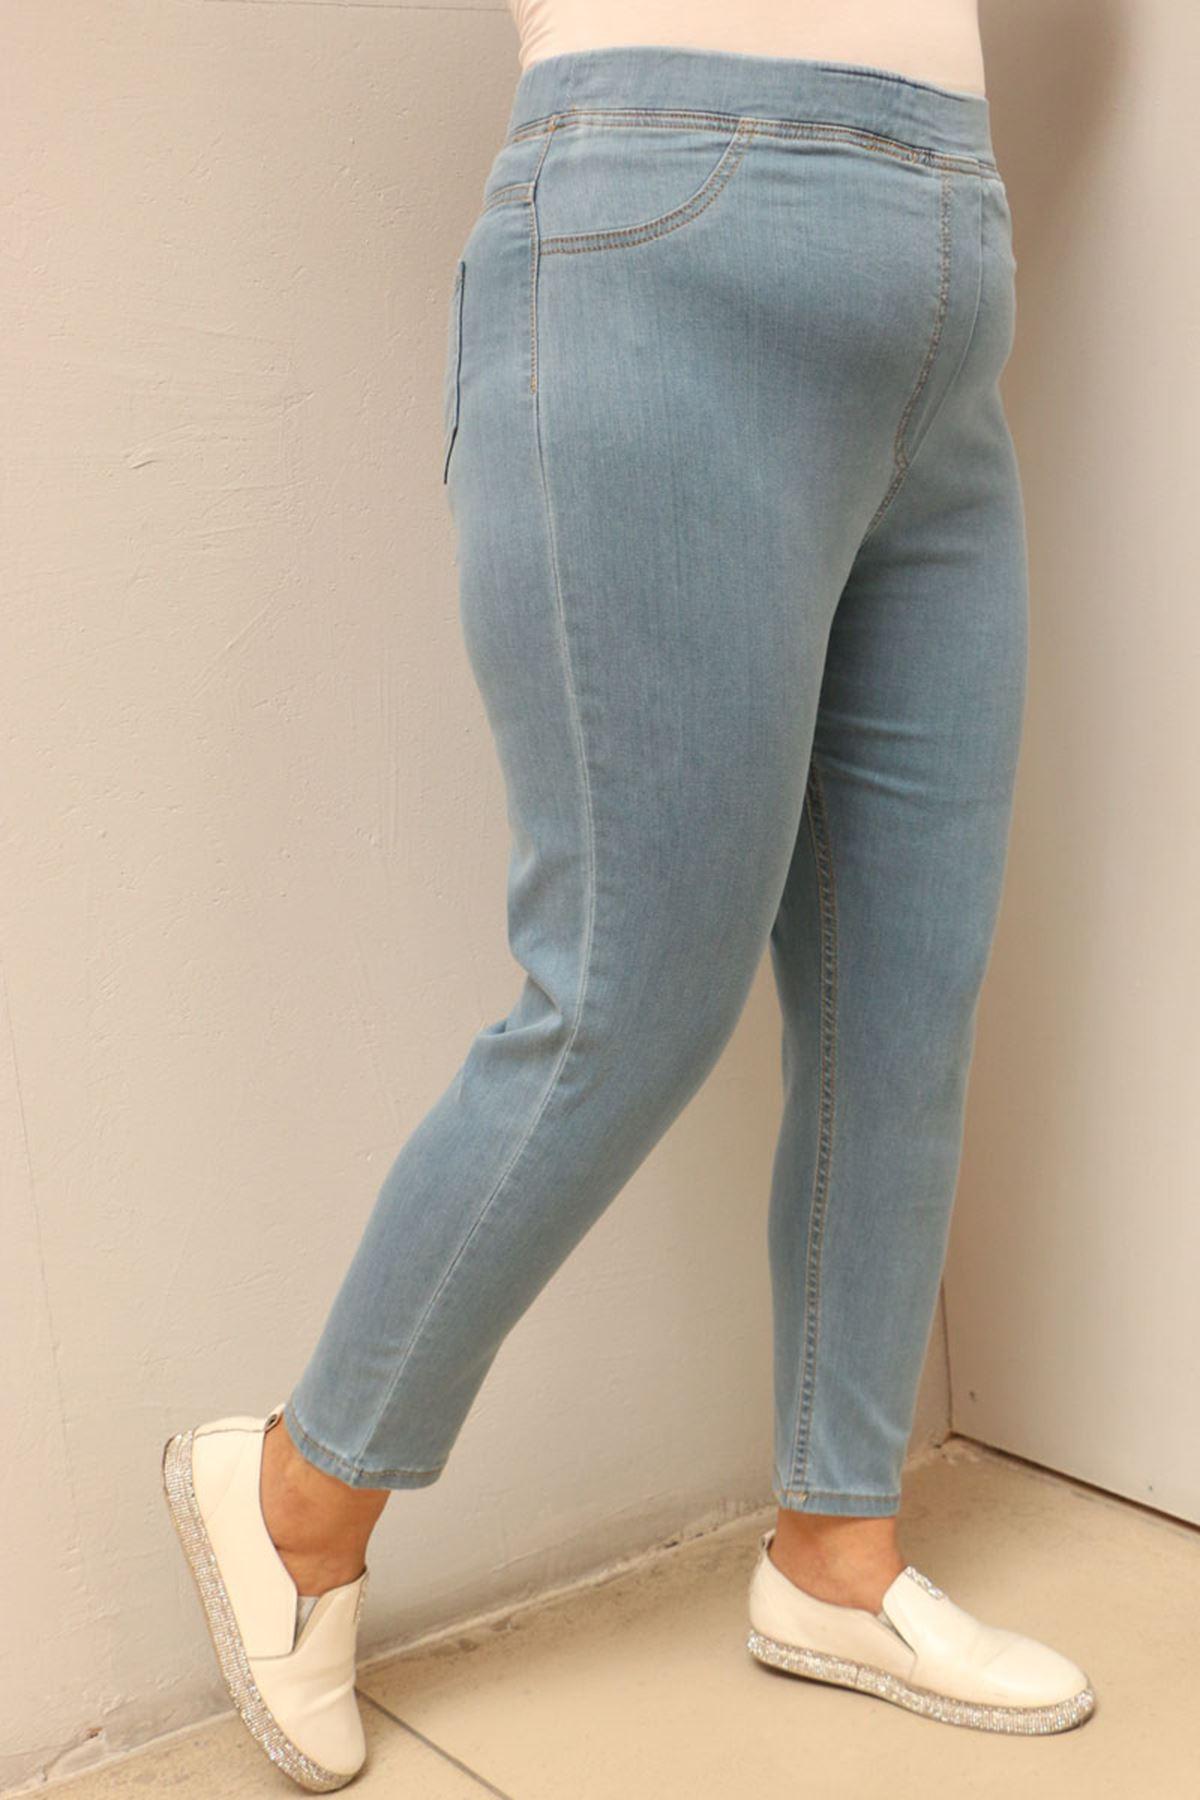 9109-13 Büyük Beden Beli Lastikli Dar Paça Pantolon - Mavi